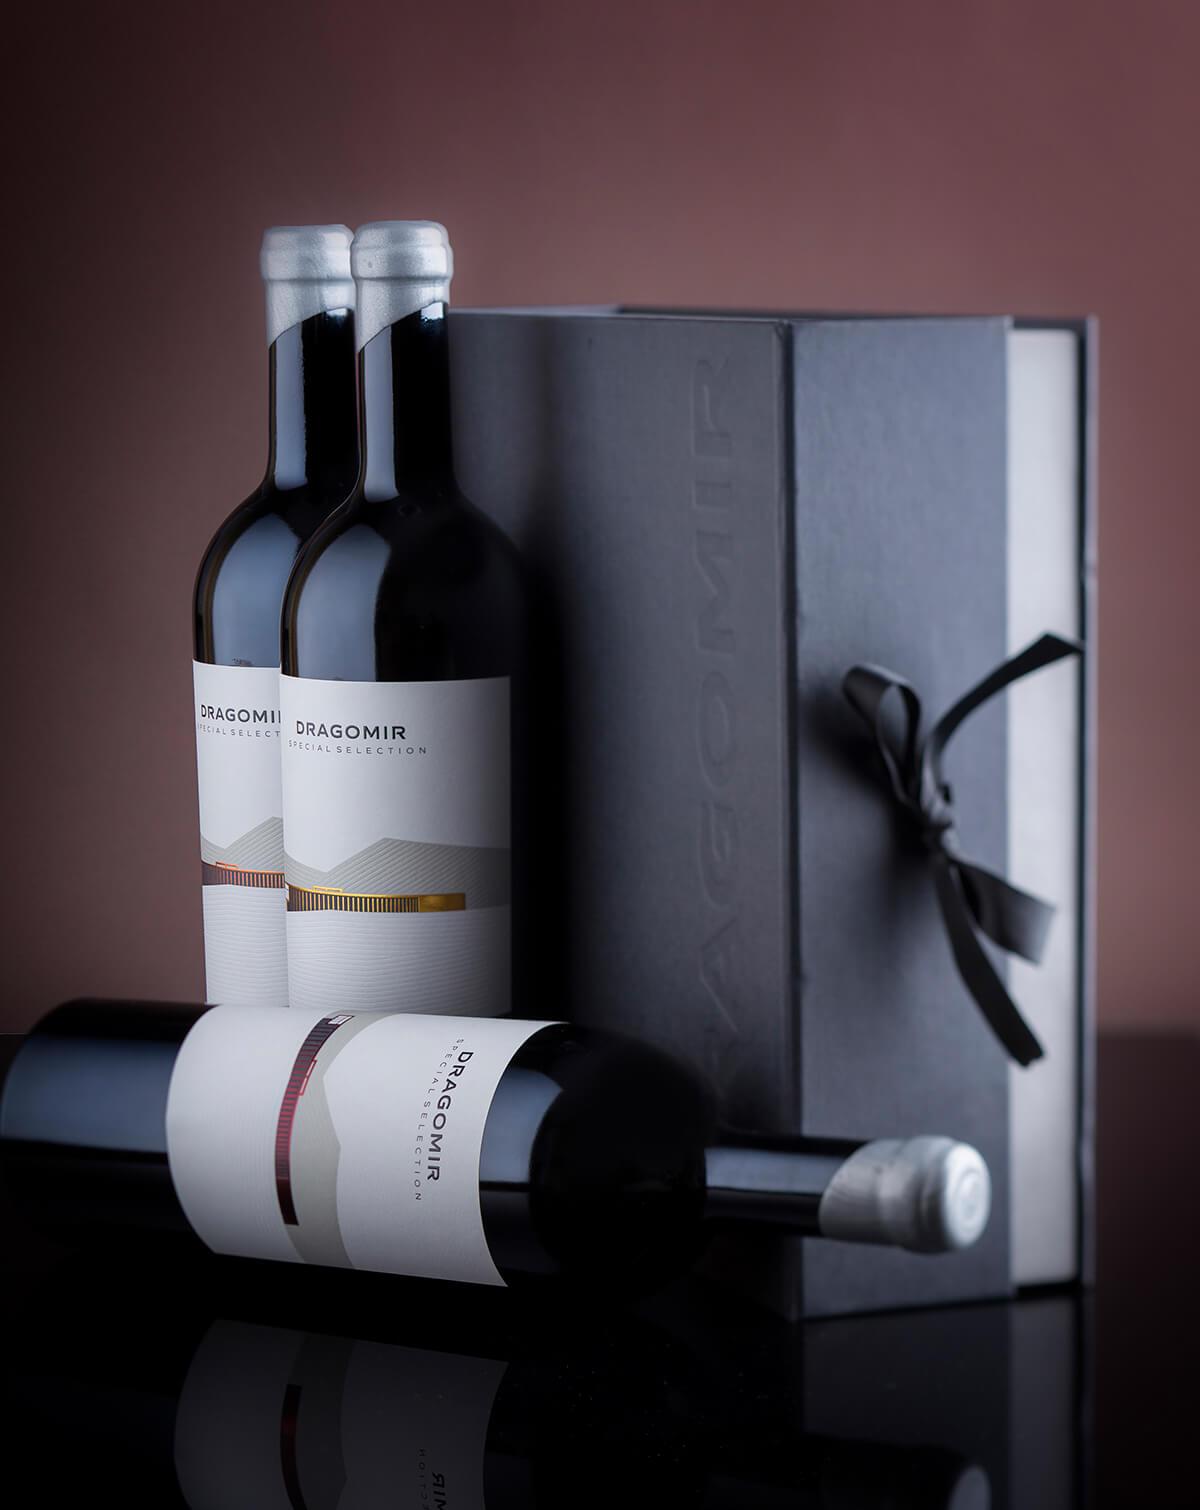 dragomir wine label design